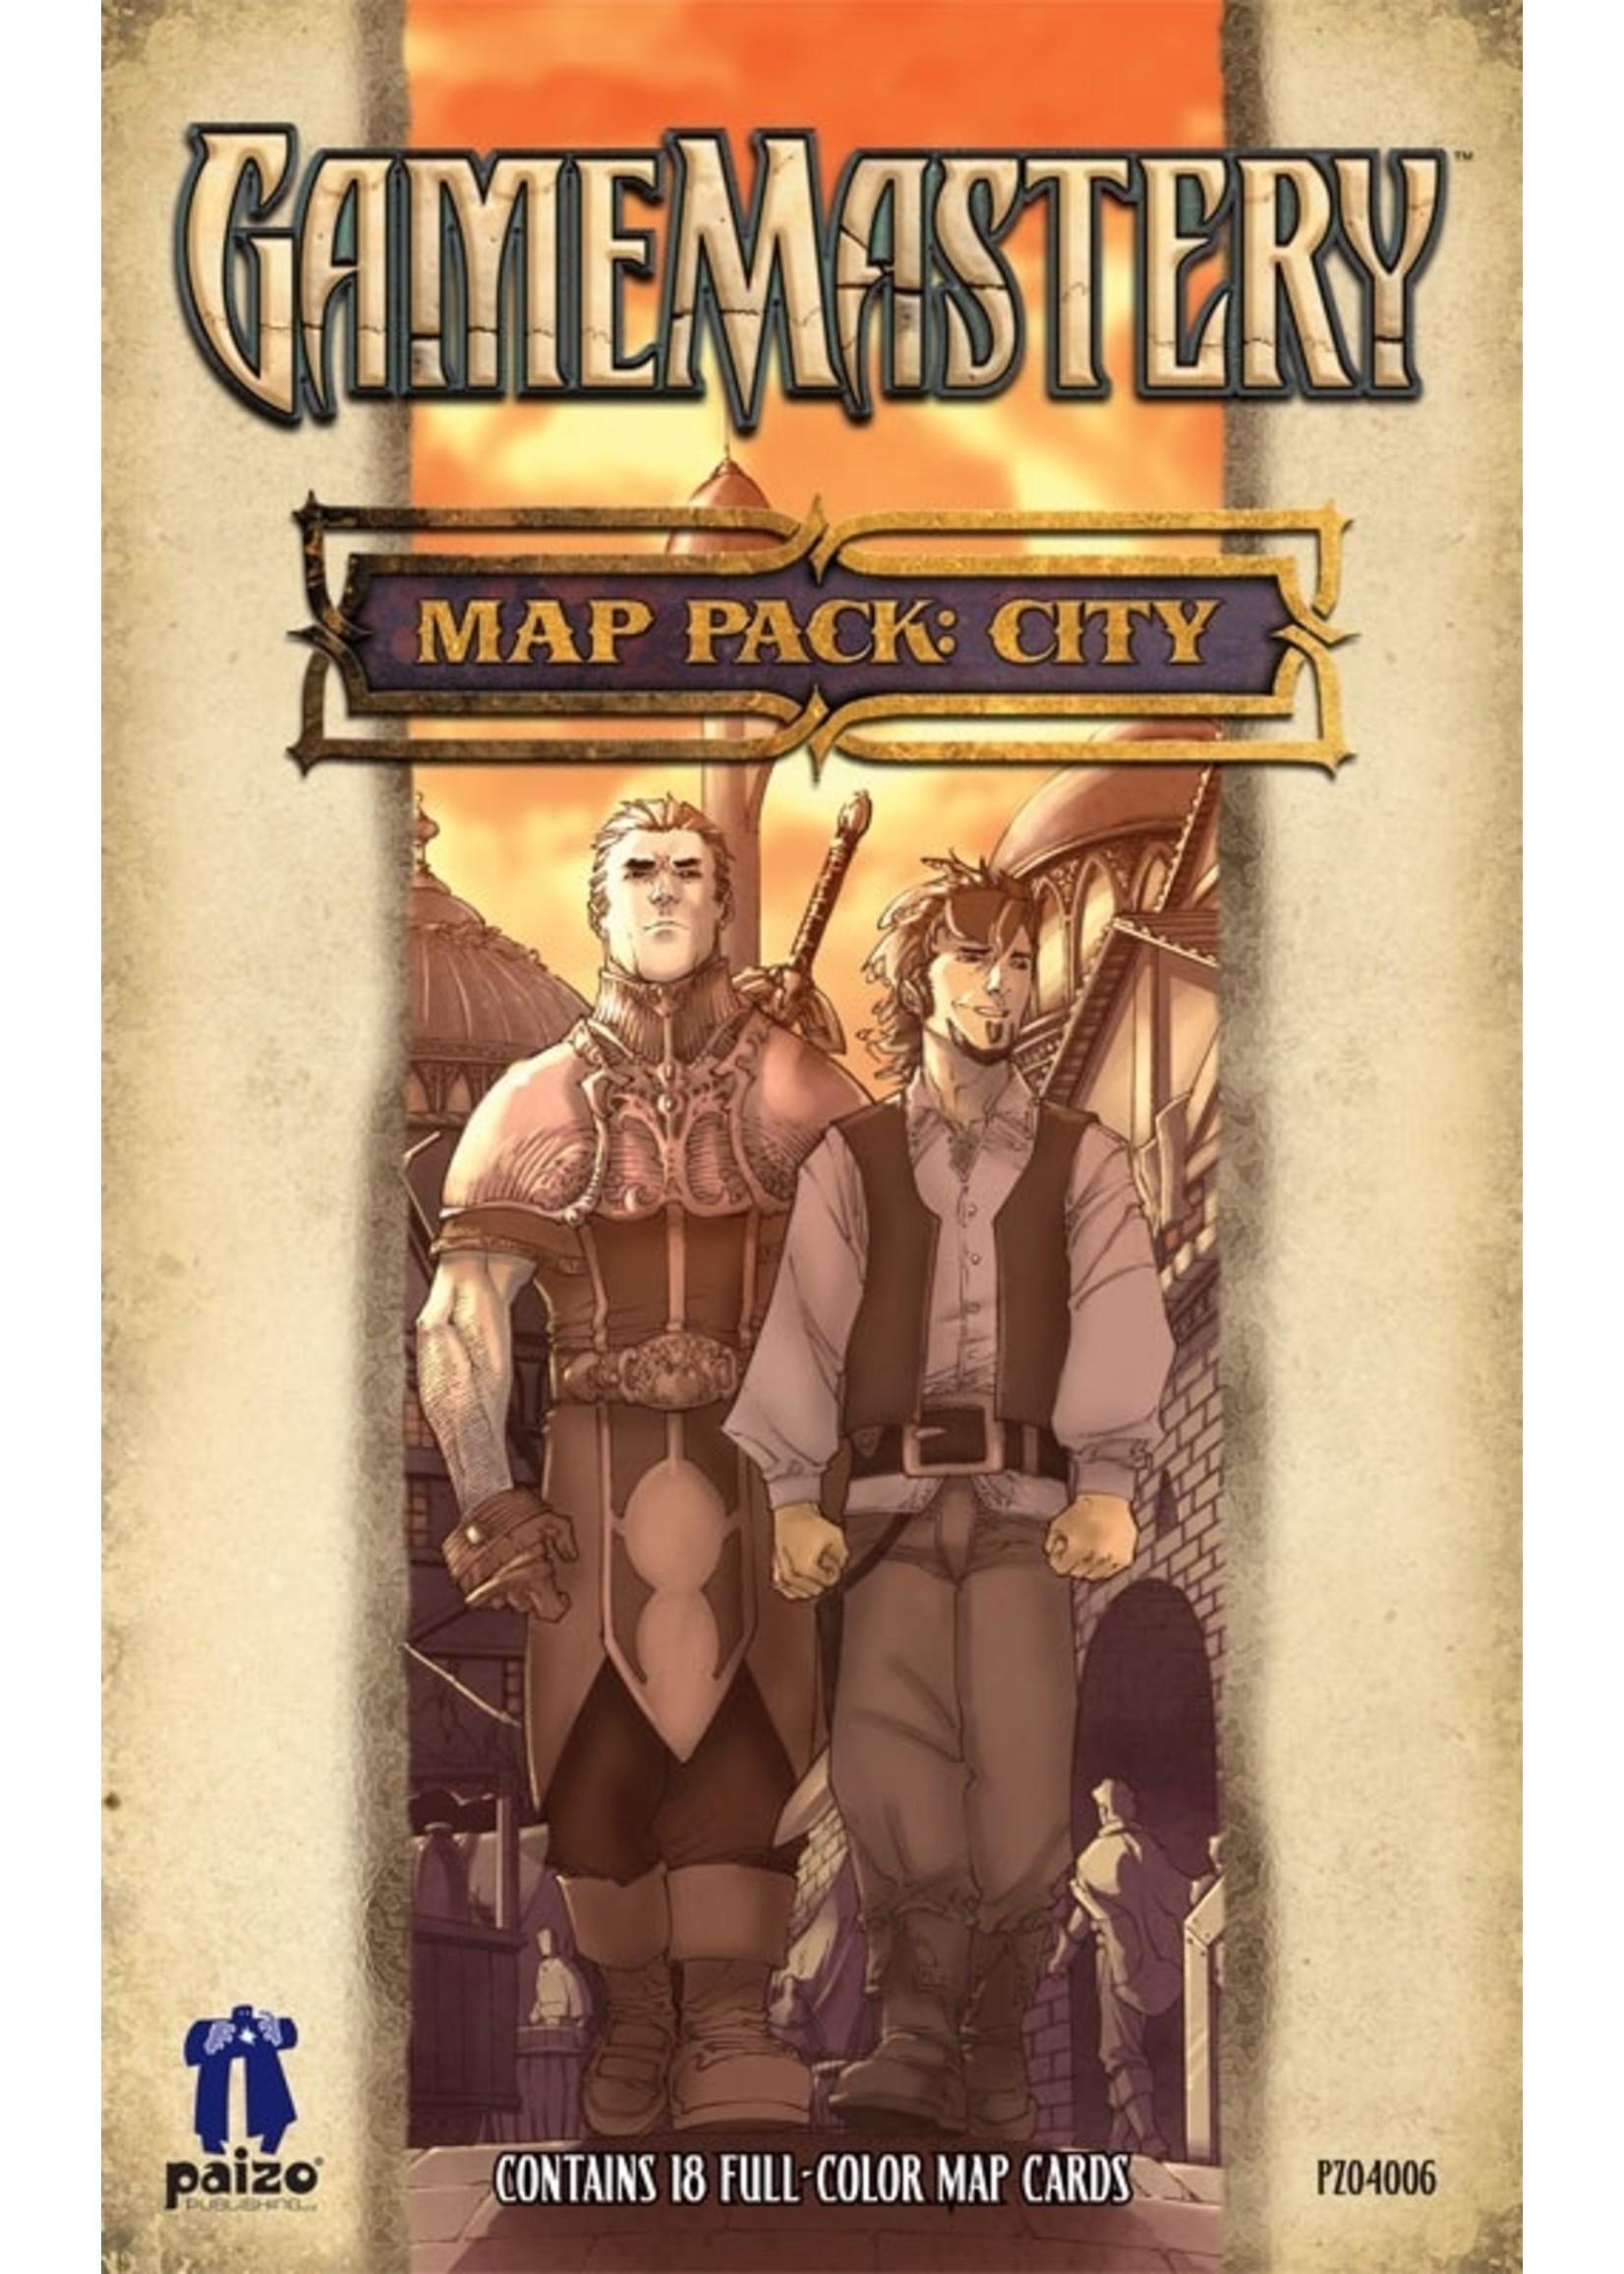 GameMastery Map Pack: City